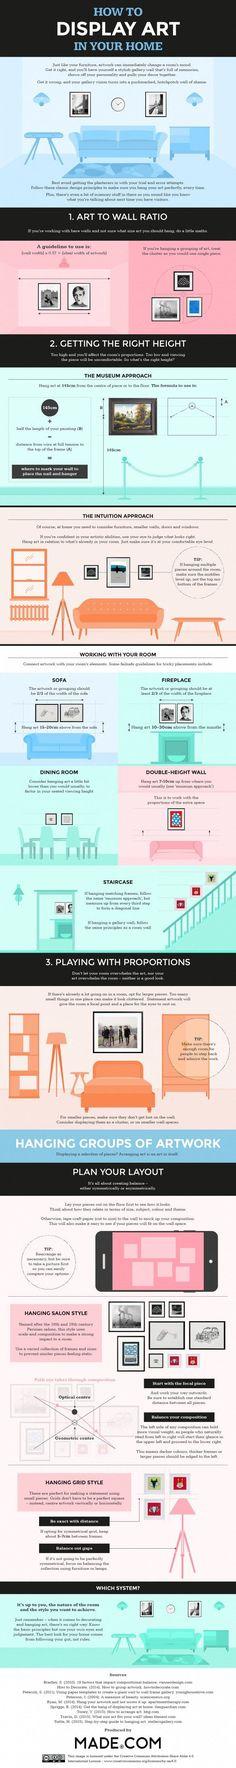 Home design infographic